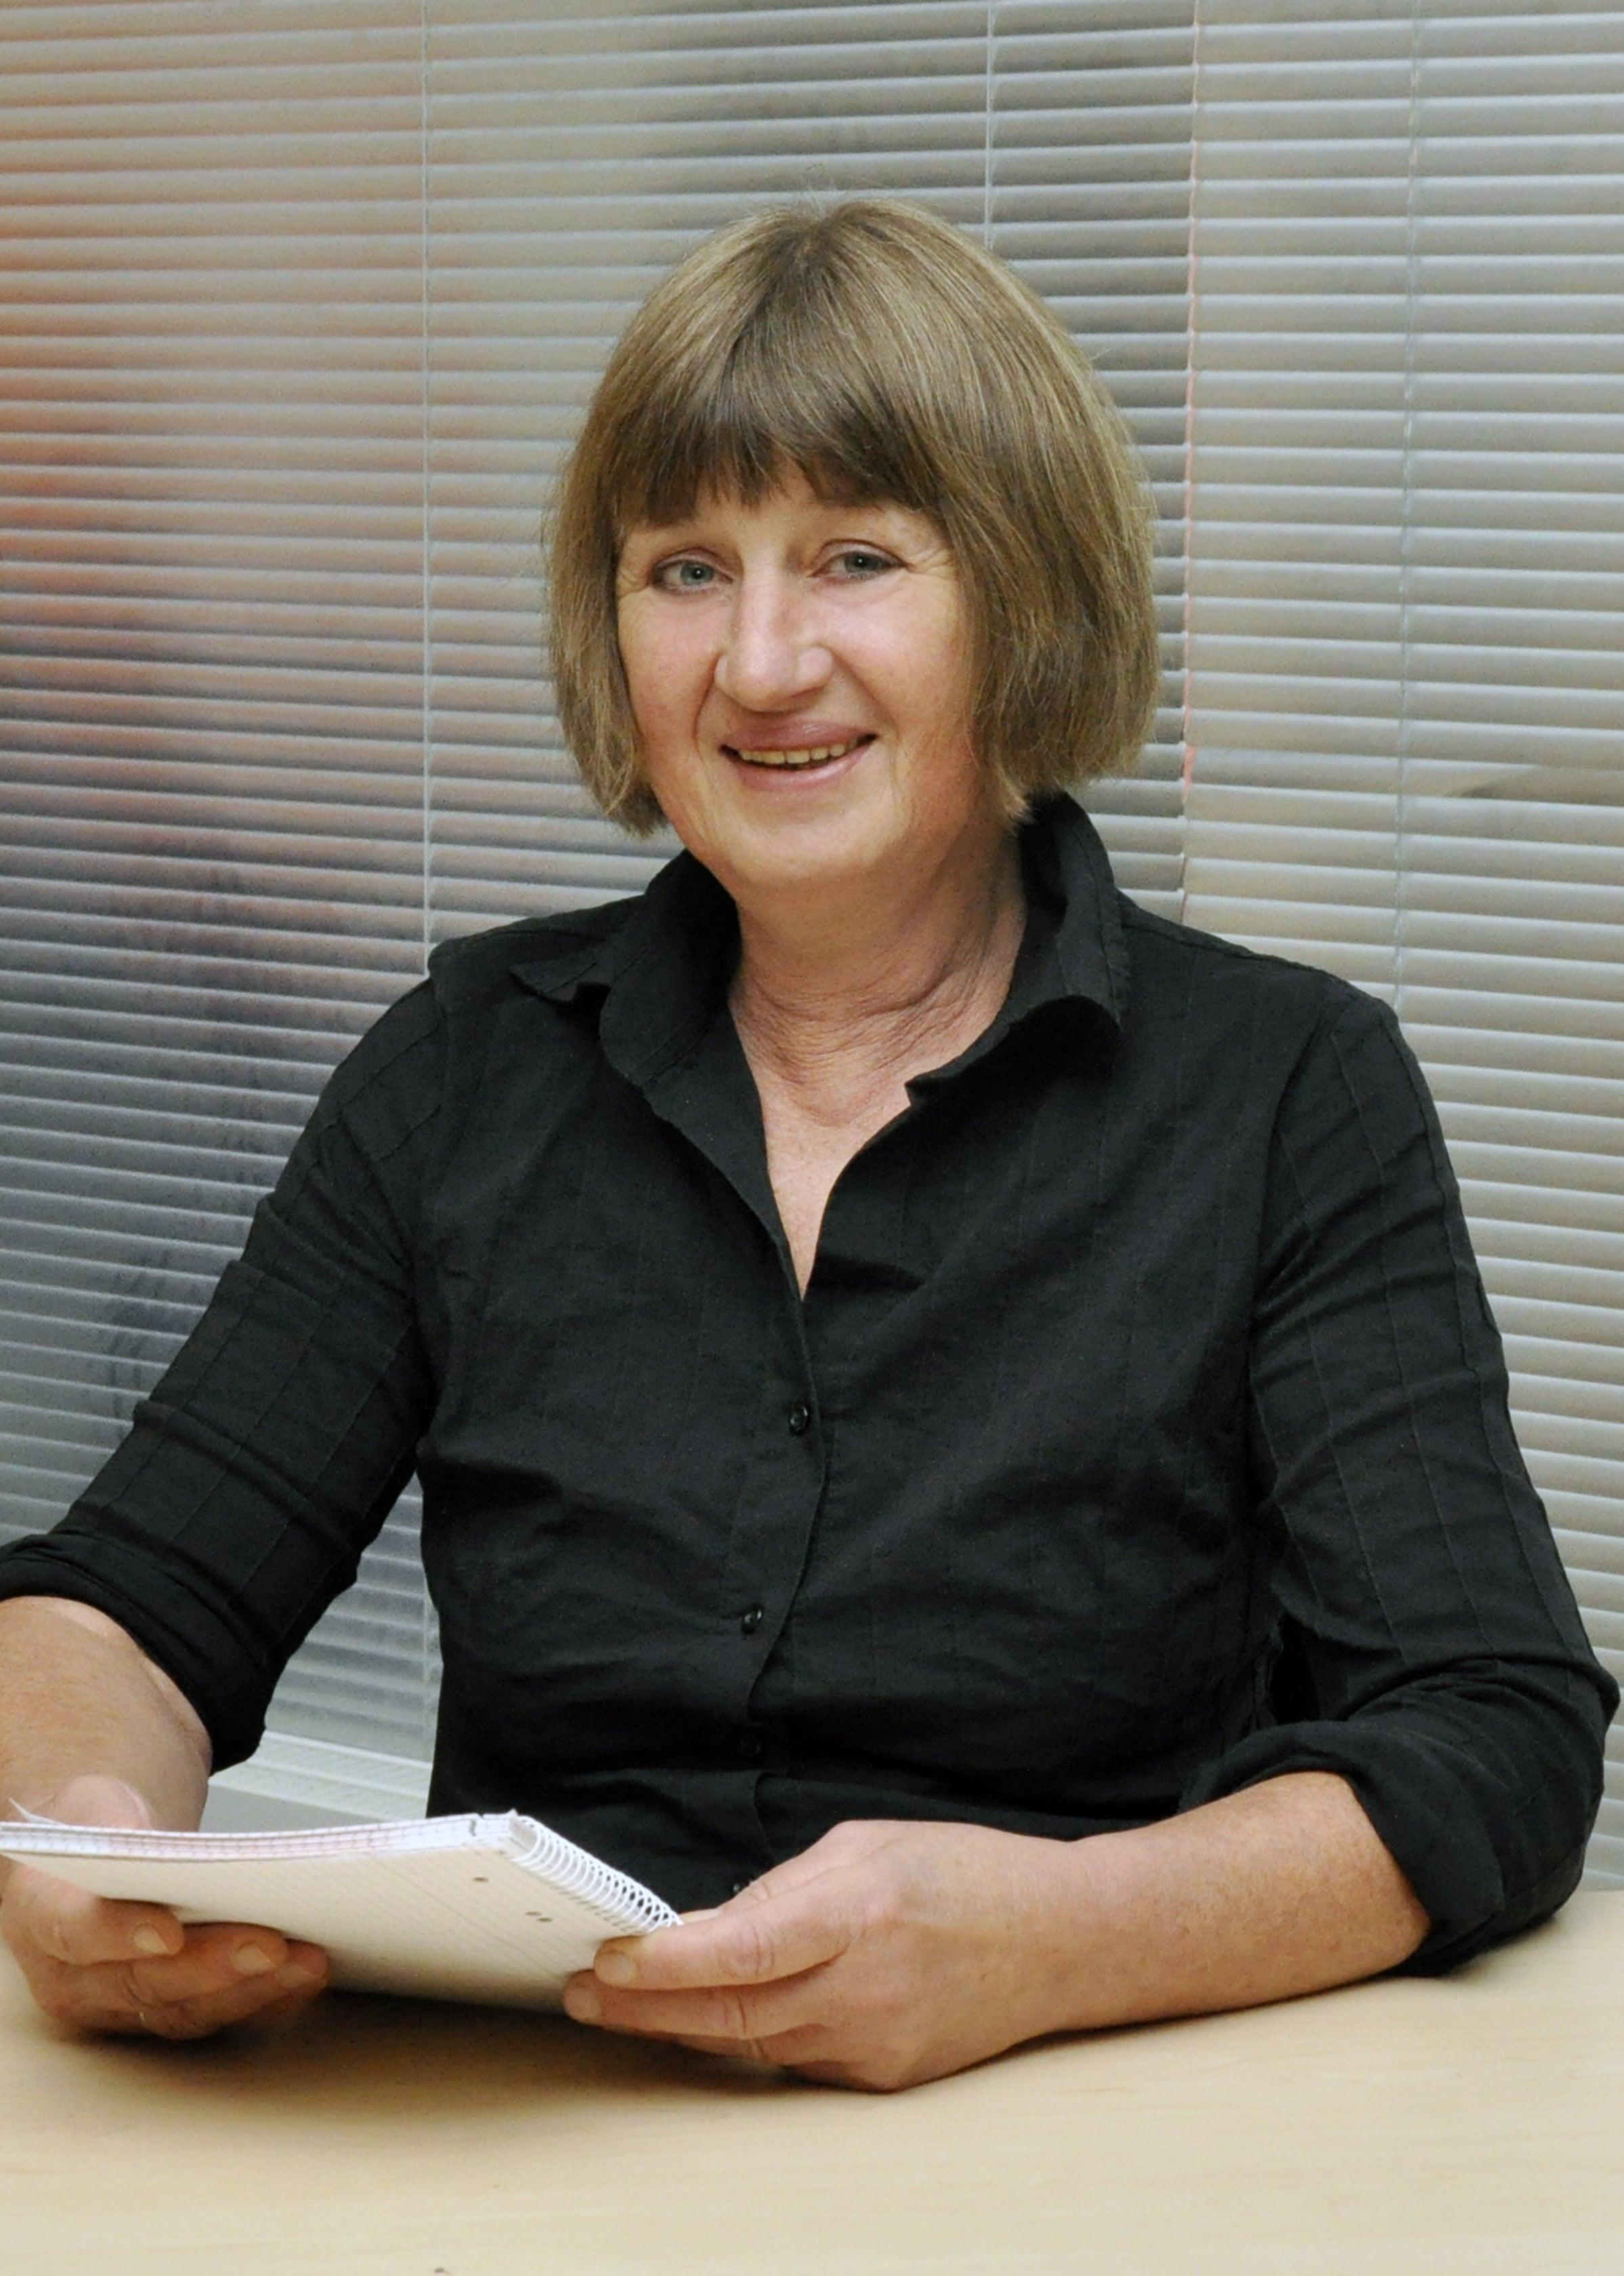 Marion Schwind-Schmitt